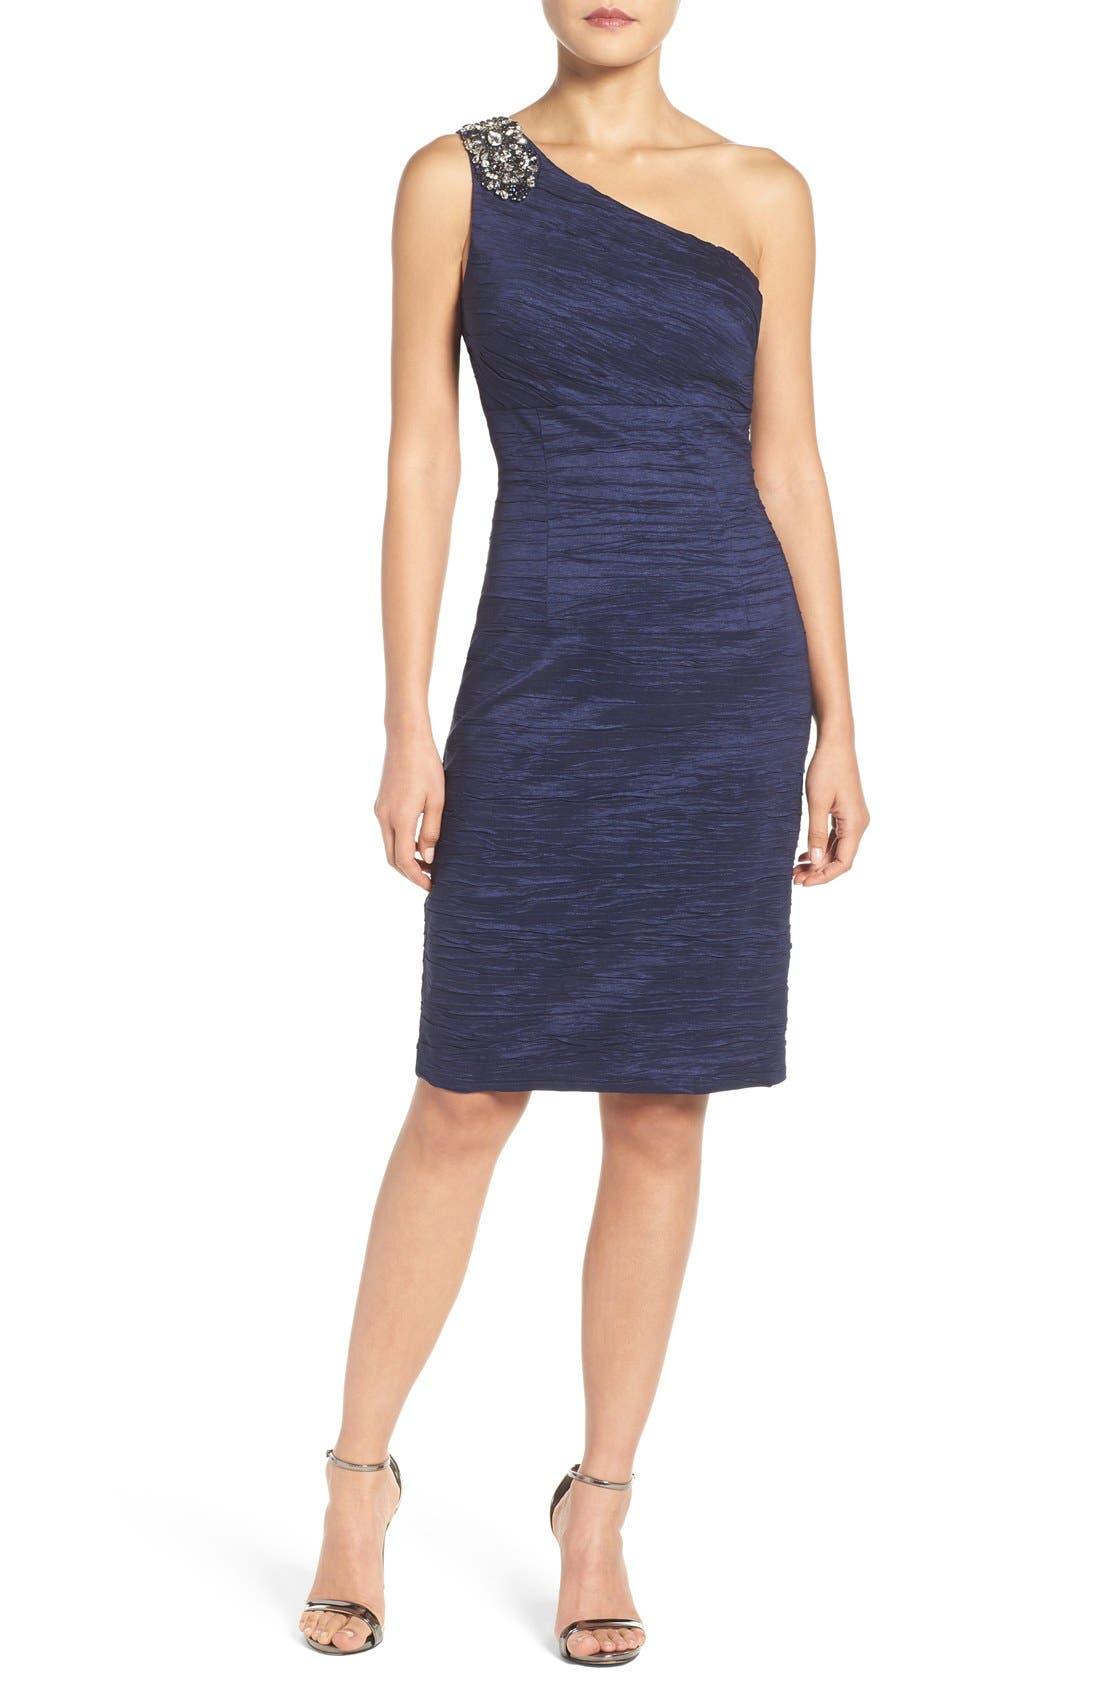 Nordstrom: Eliza J Embellished Taffeta Sheath Dress (Regular & Petite